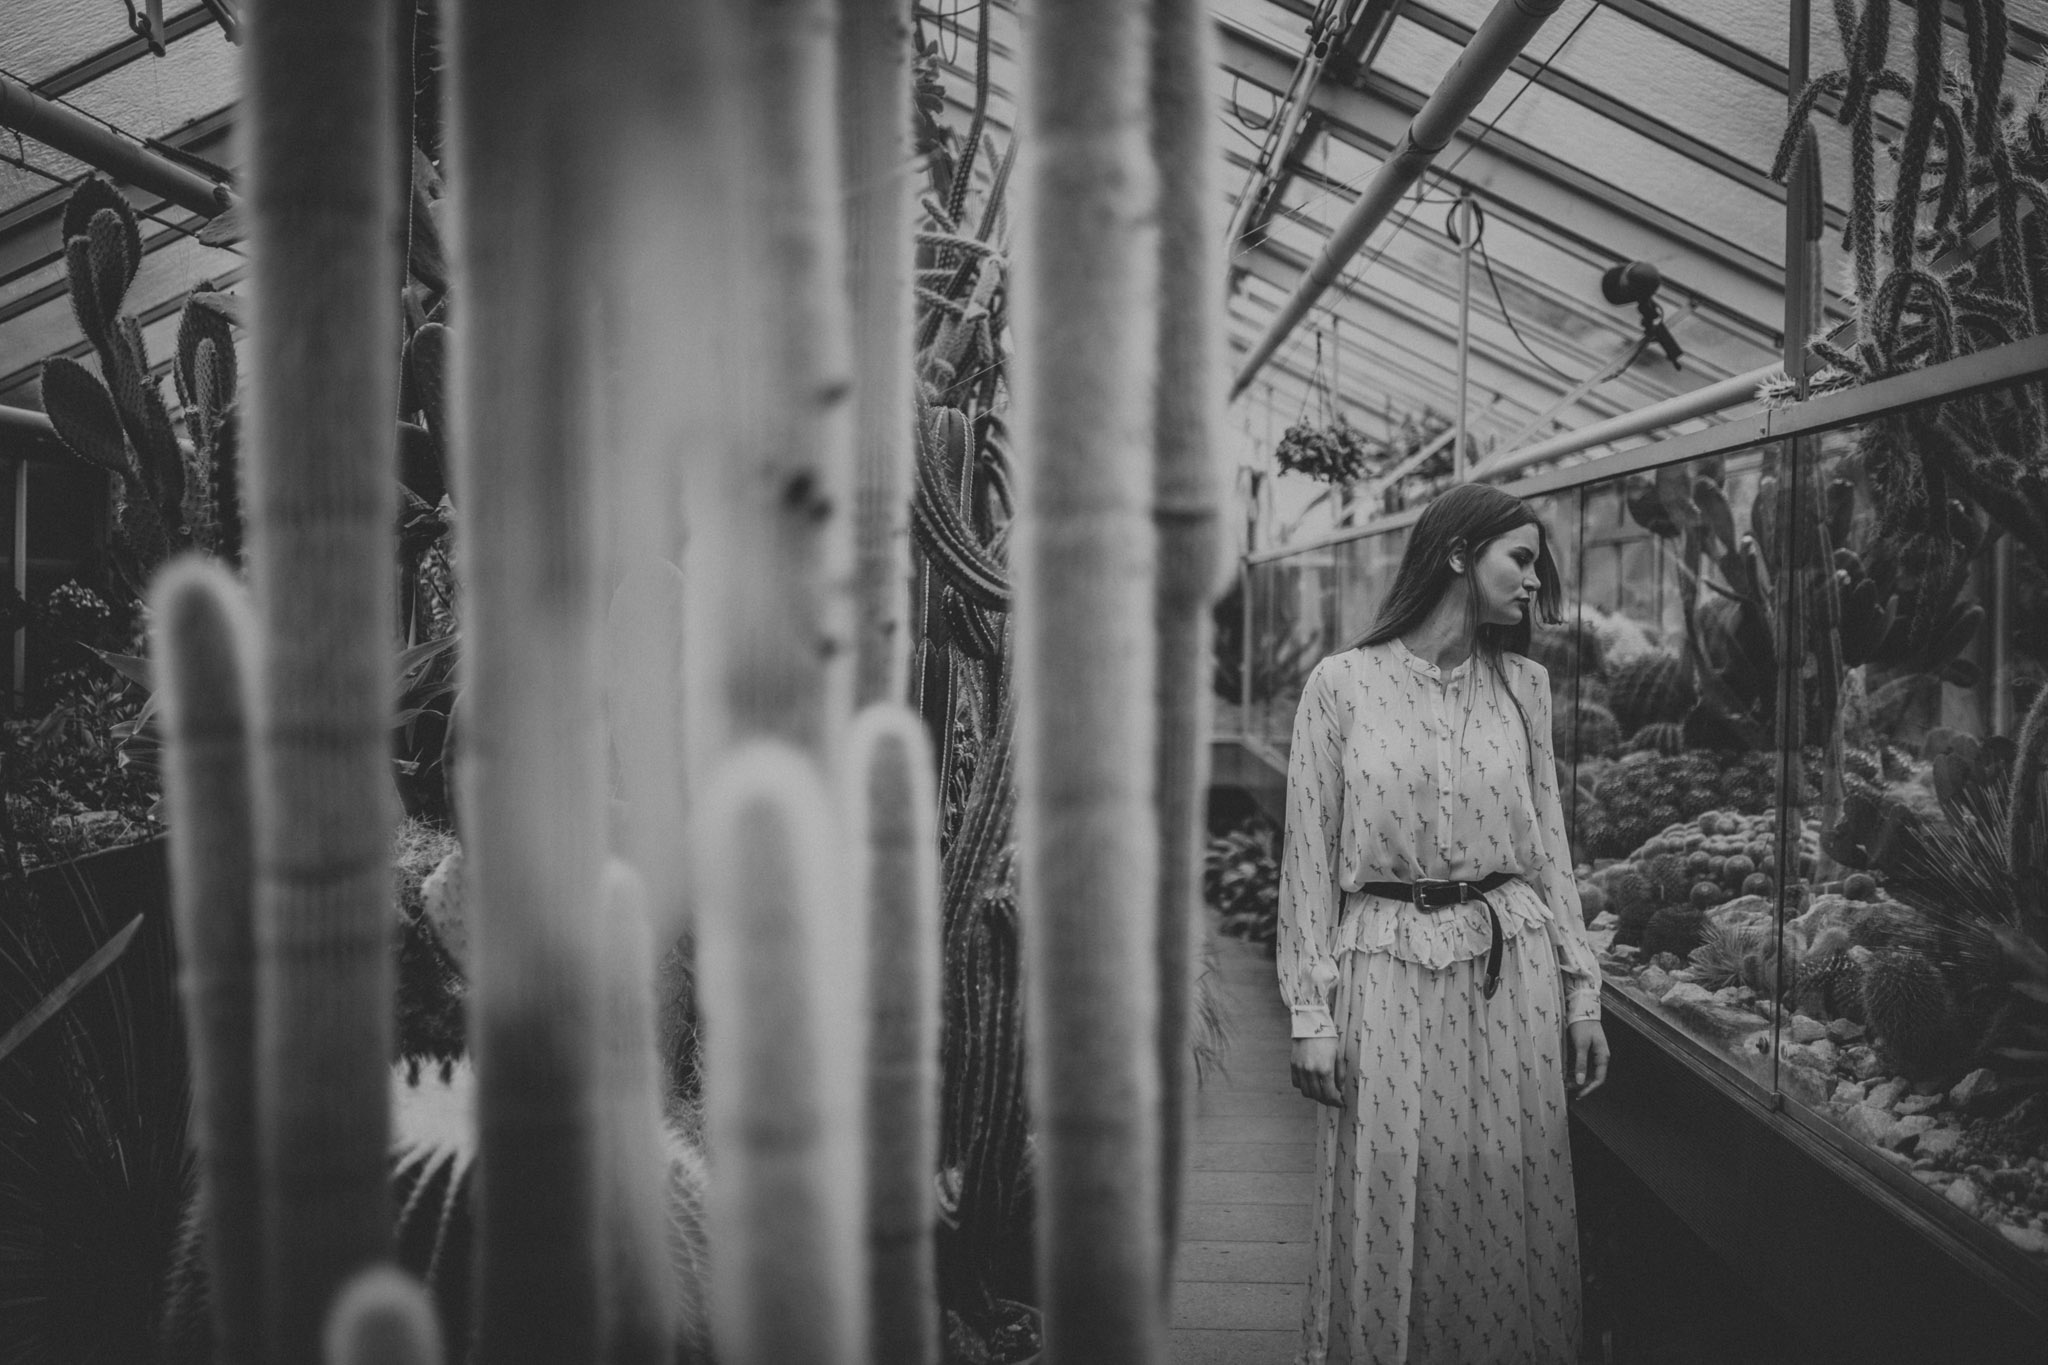 Magda-Botanischer-Garten-Erlangen-2.jpg